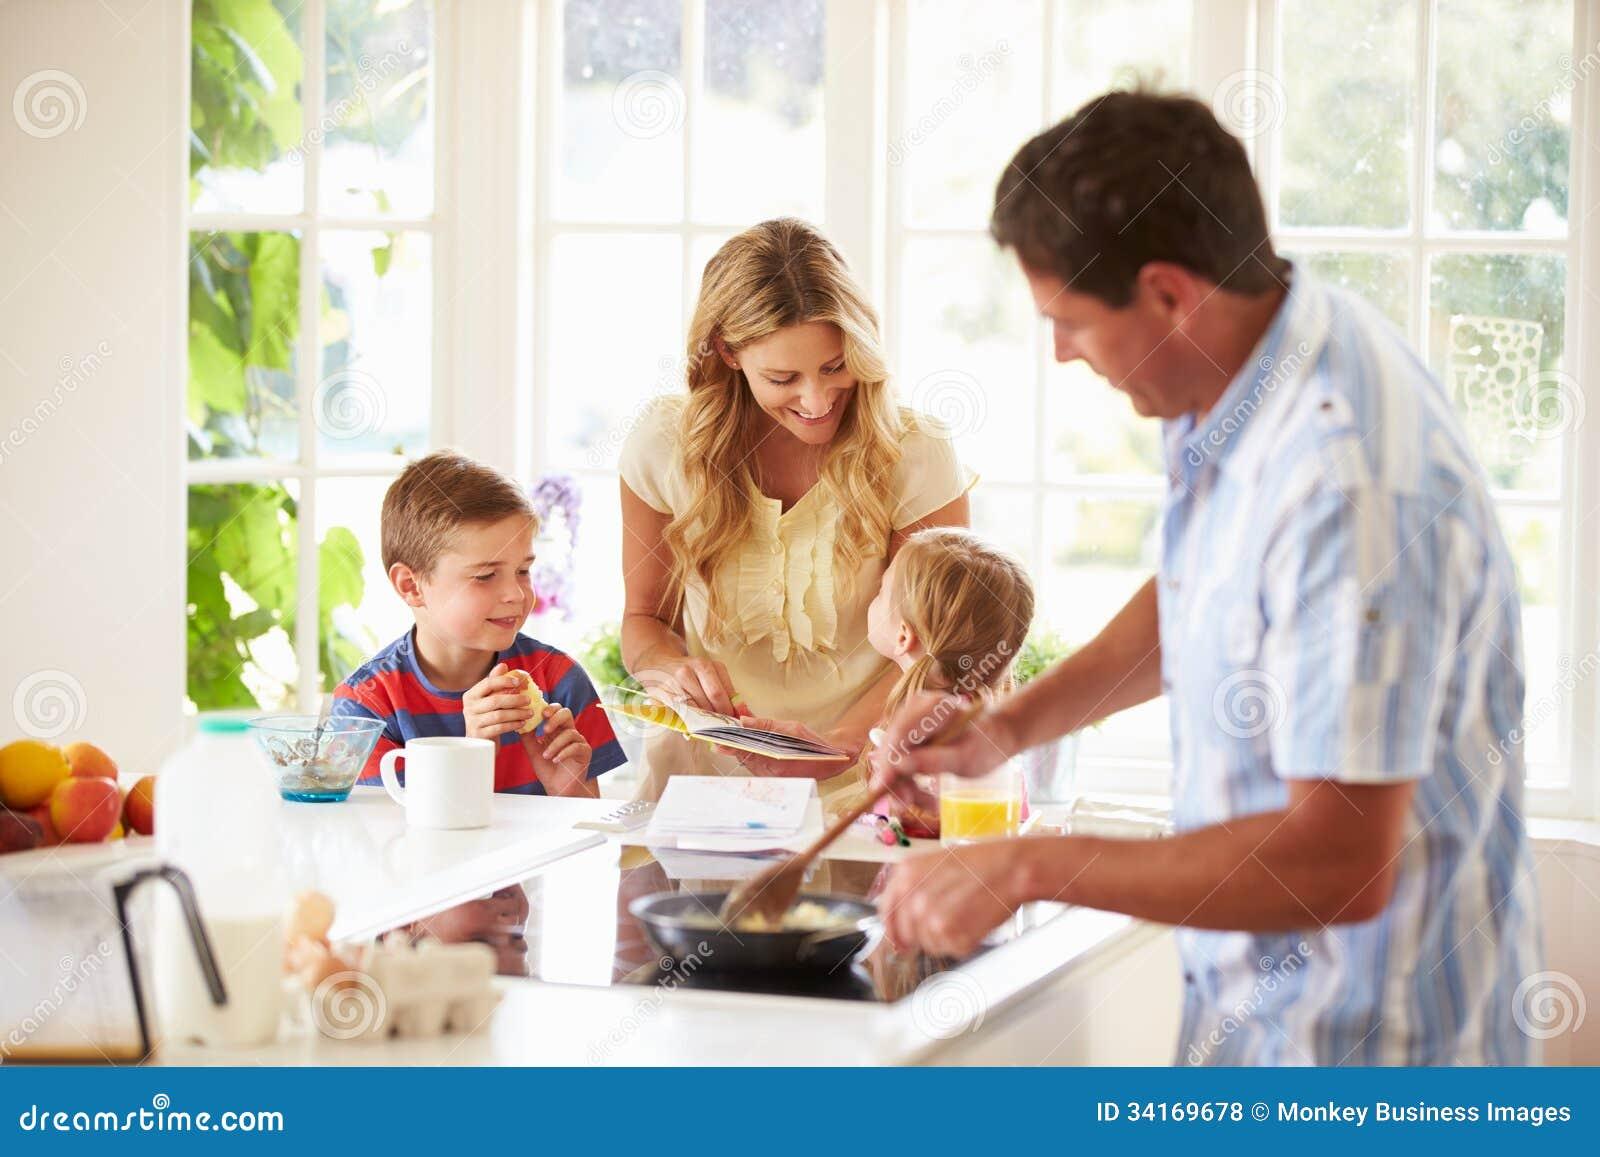 Сын с матерью на кухне 31 фотография